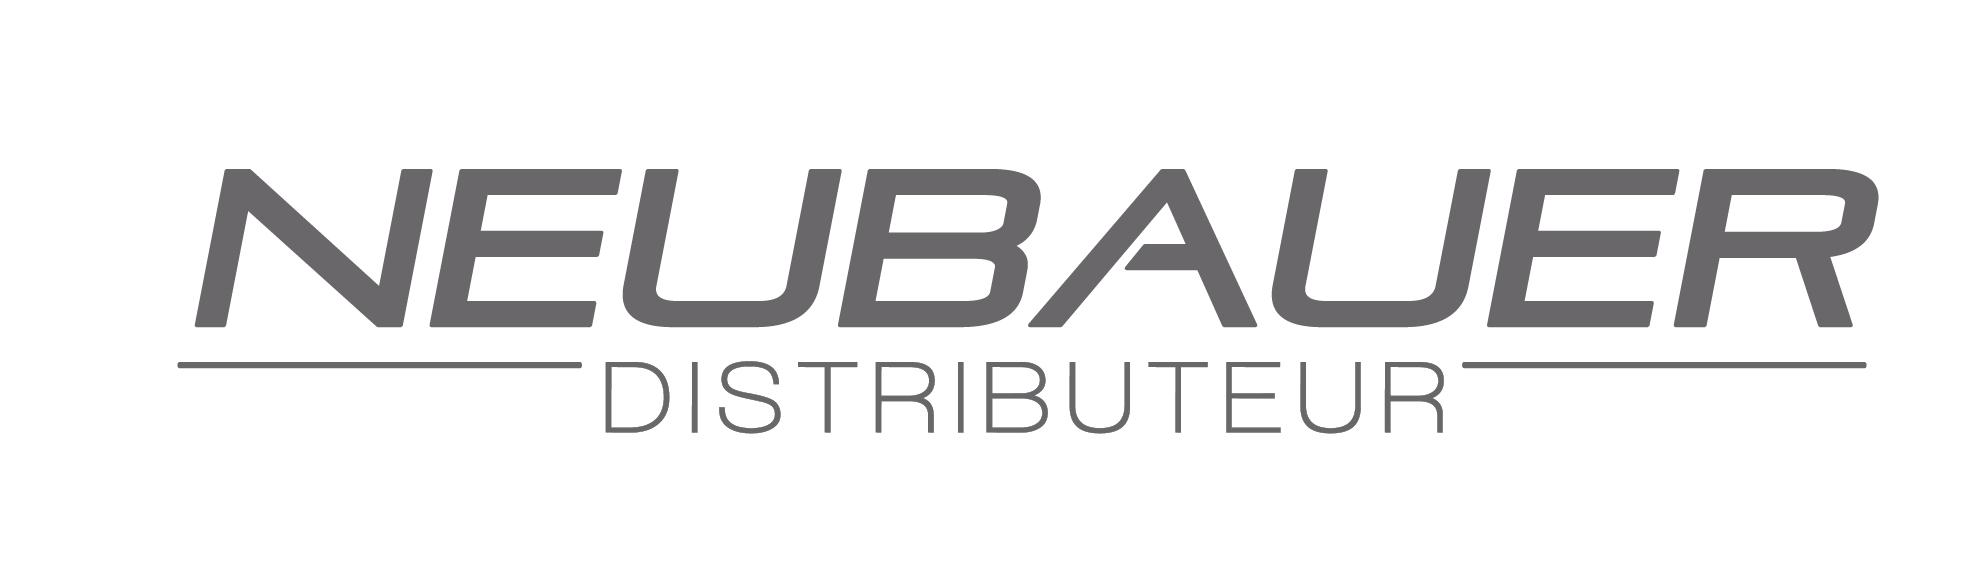 NEUBAUER-distrib-L600